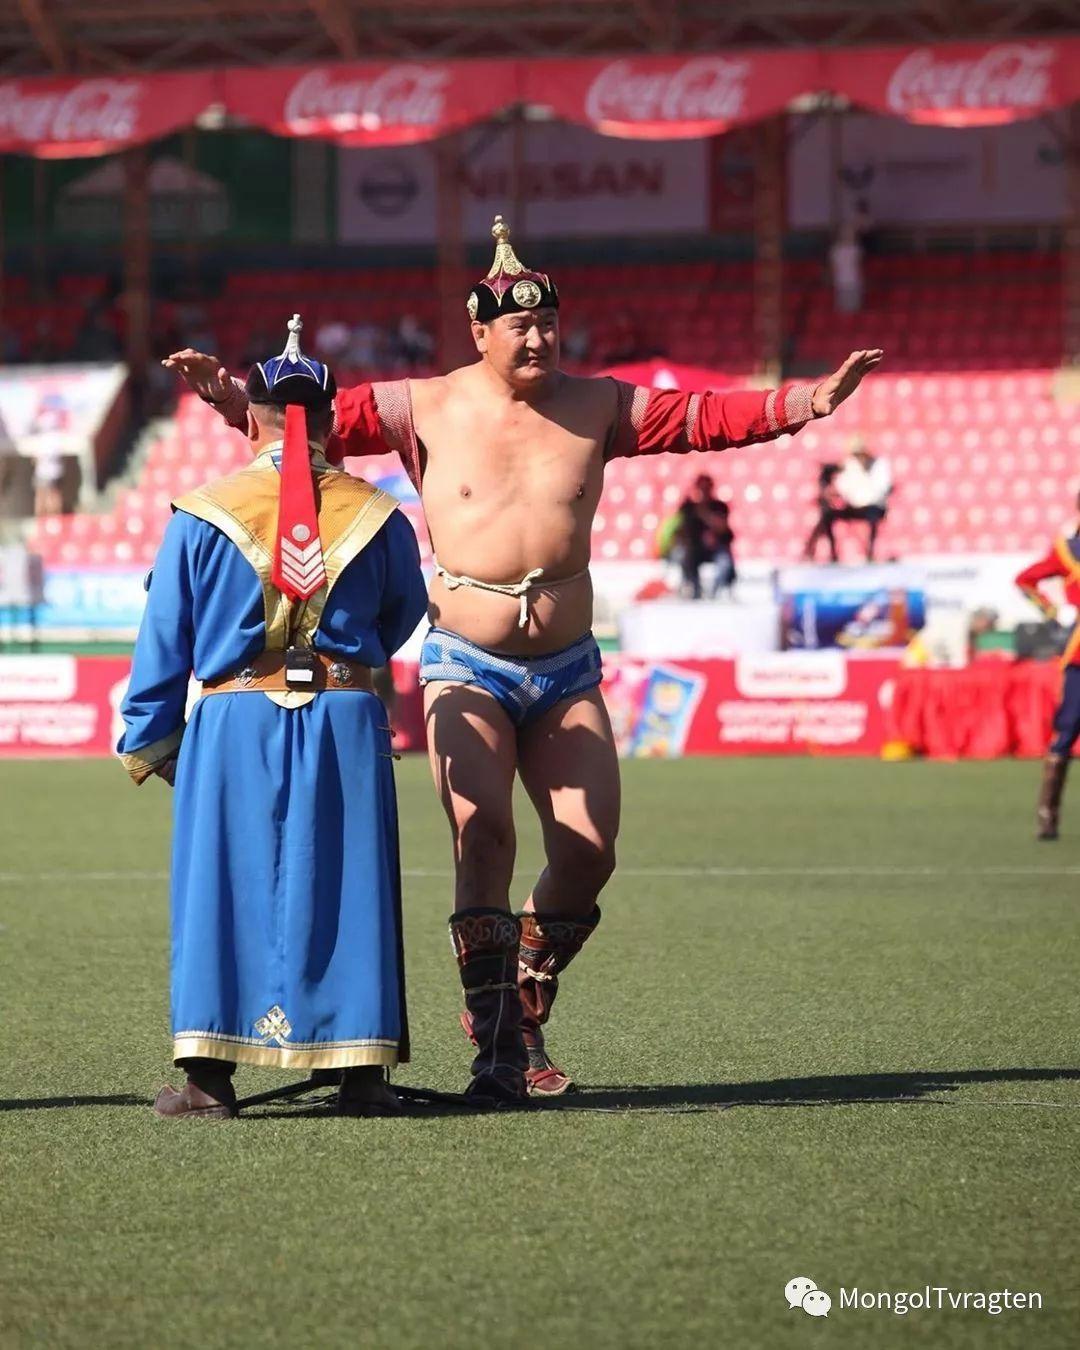 ᠮᠣᠩᠭᠣᠯ ᠨᠠᠭᠠᠳᠣᠮ 那达慕 第27张 ᠮᠣᠩᠭᠣᠯ ᠨᠠᠭᠠᠳᠣᠮ 那达慕 蒙古文化